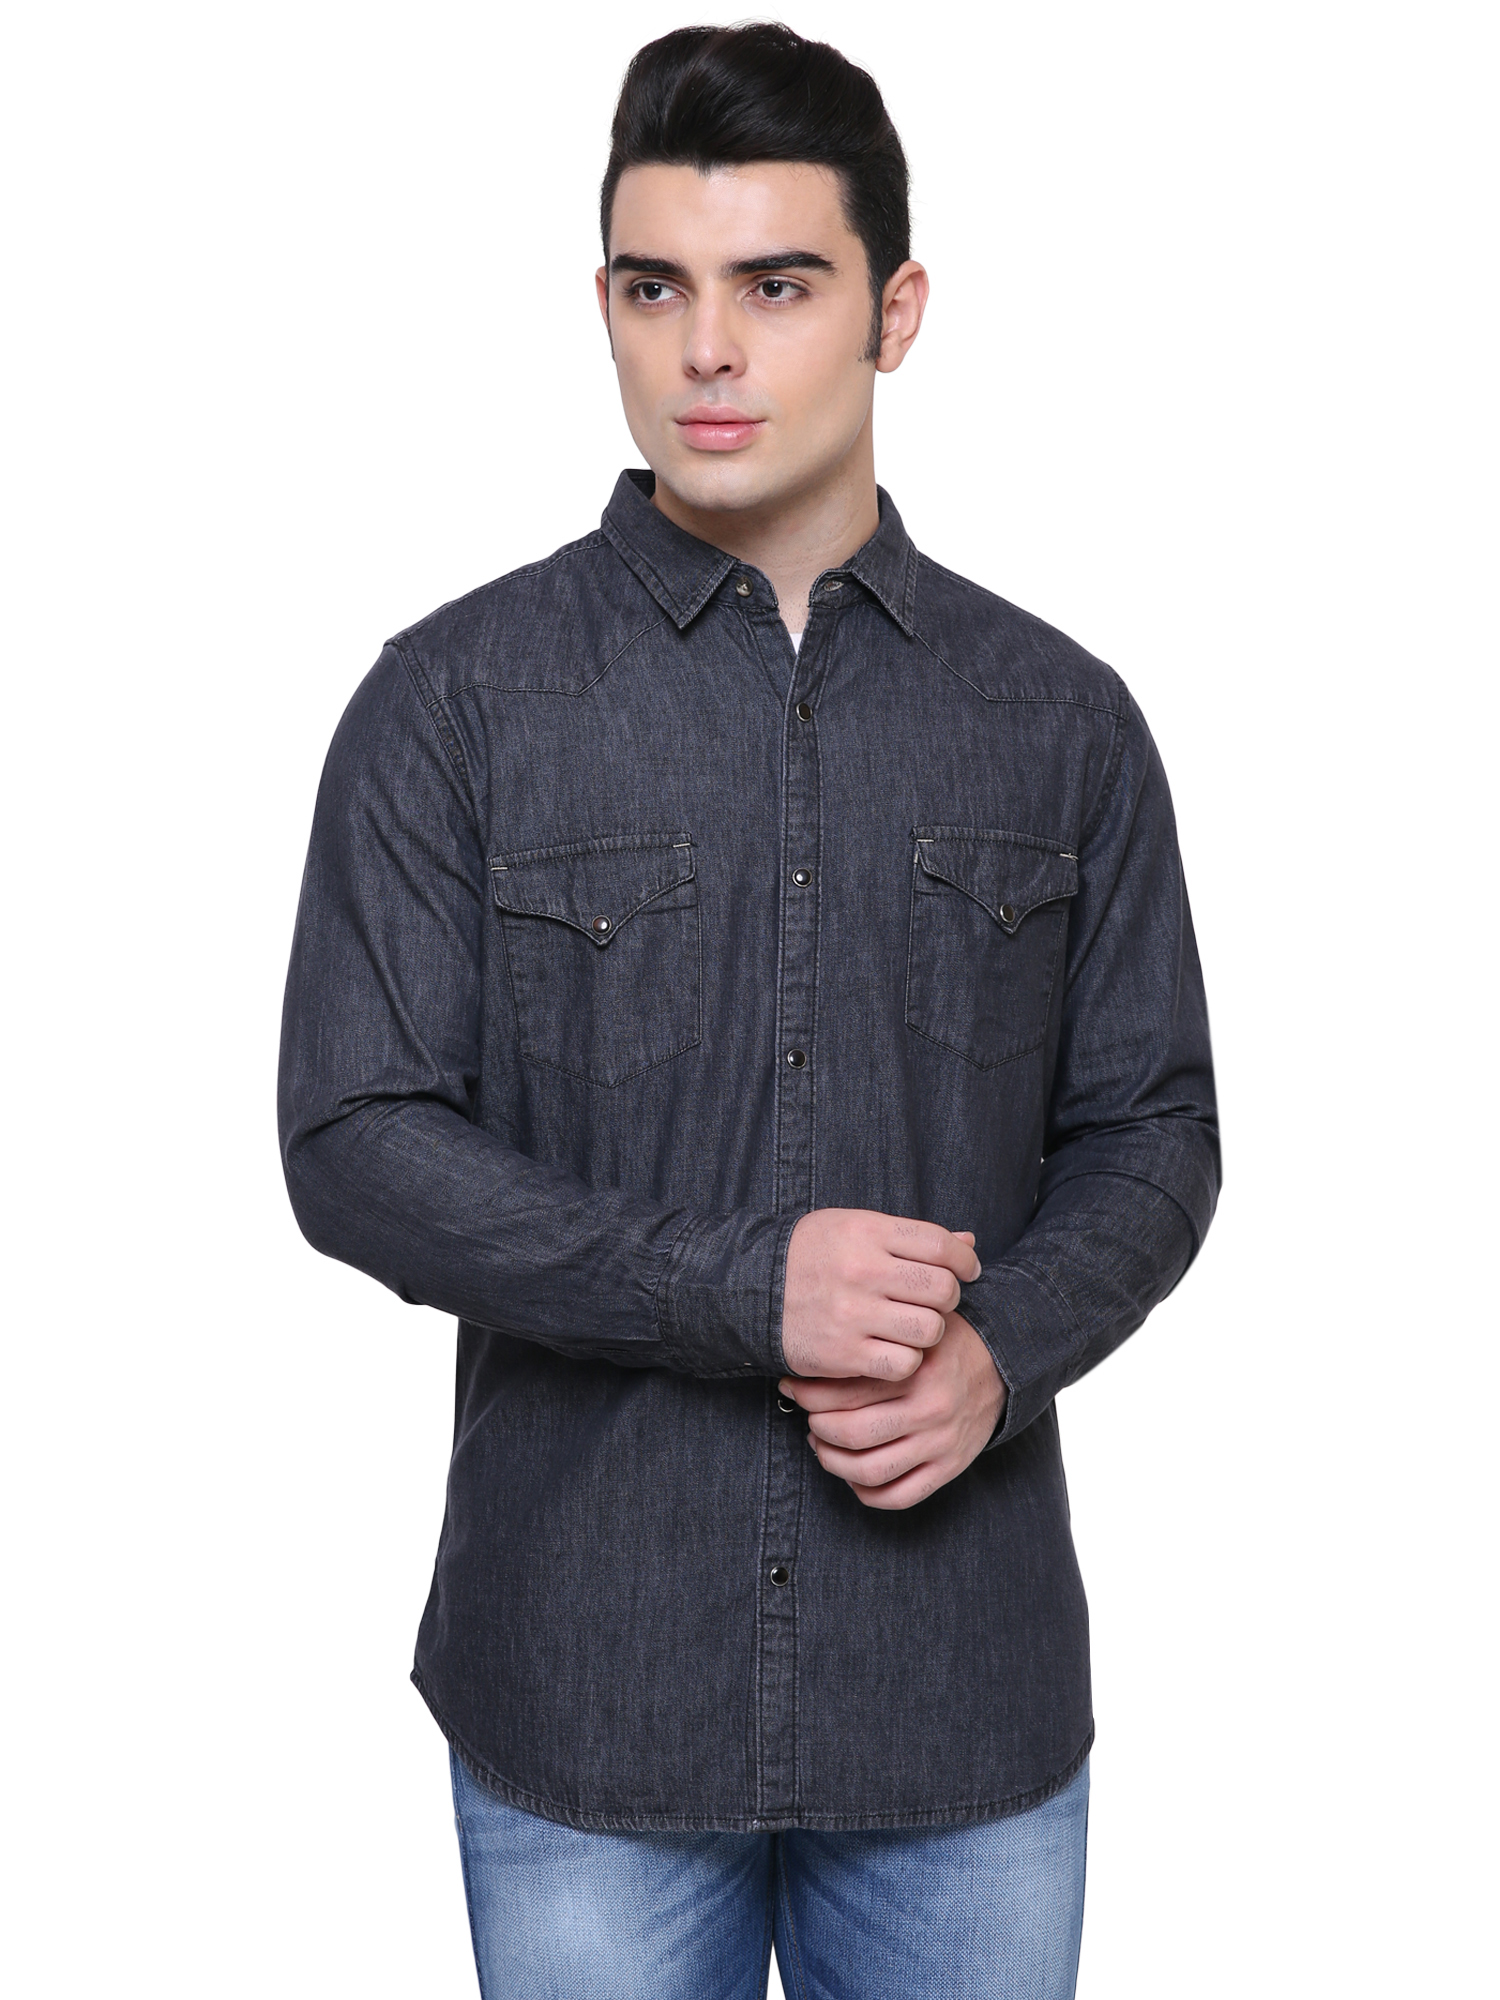 Southbay   Southbay Men's Charcoal Black Casual Denim Shirt- SBCLFS975BK